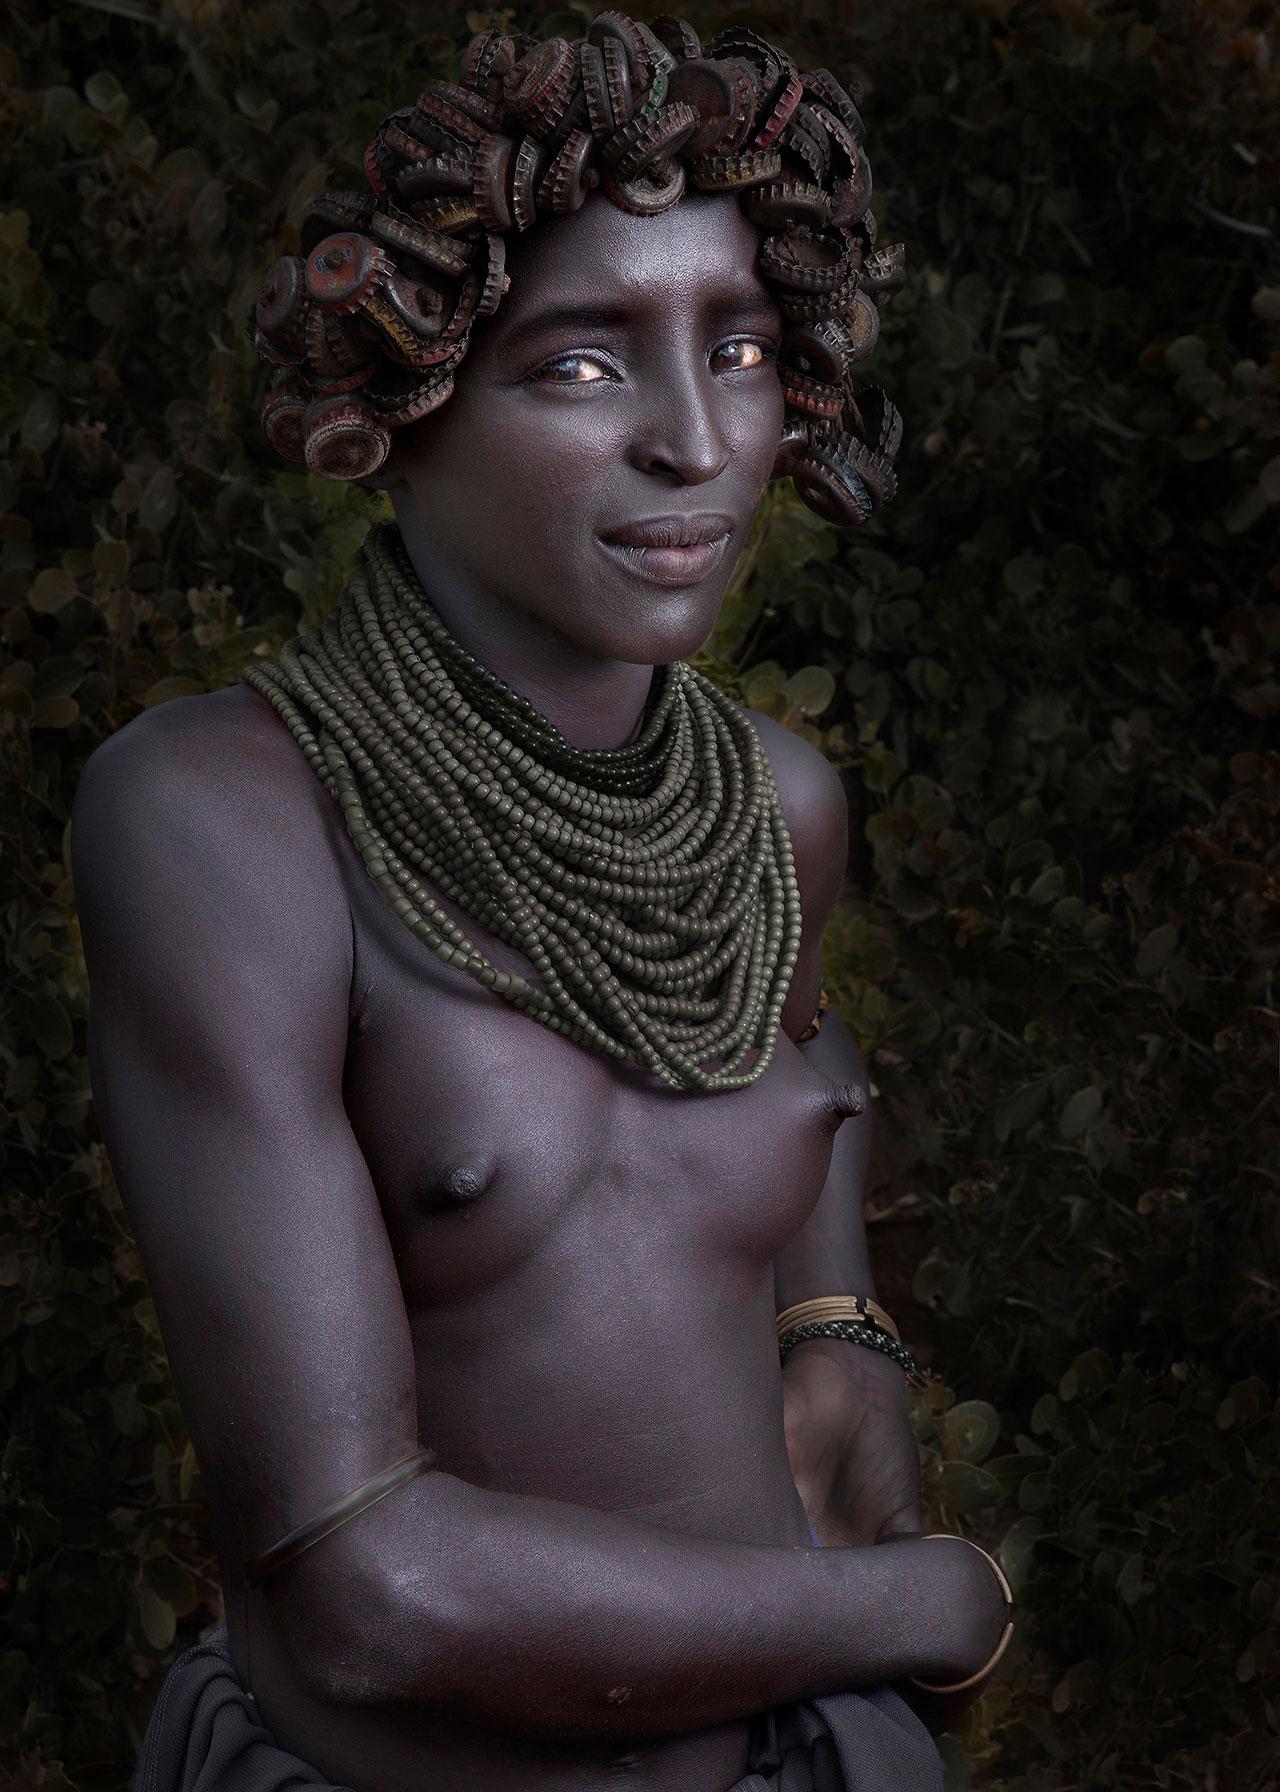 William Ropp - Ethiopiques - Felix Schoeller Photoaward